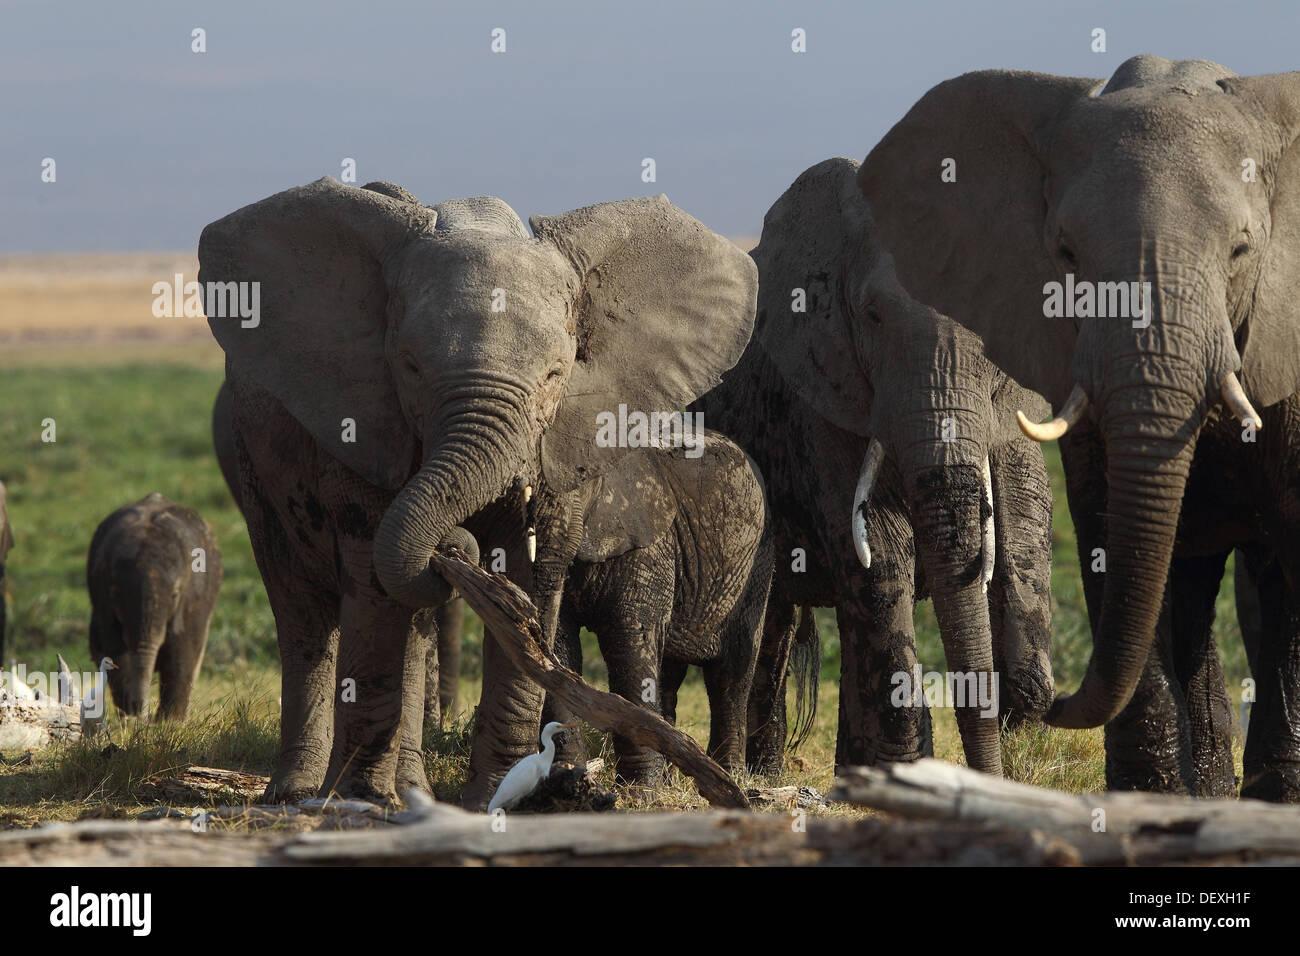 African Elephant Herd in Amboseli National Park, Kenya - Stock Image